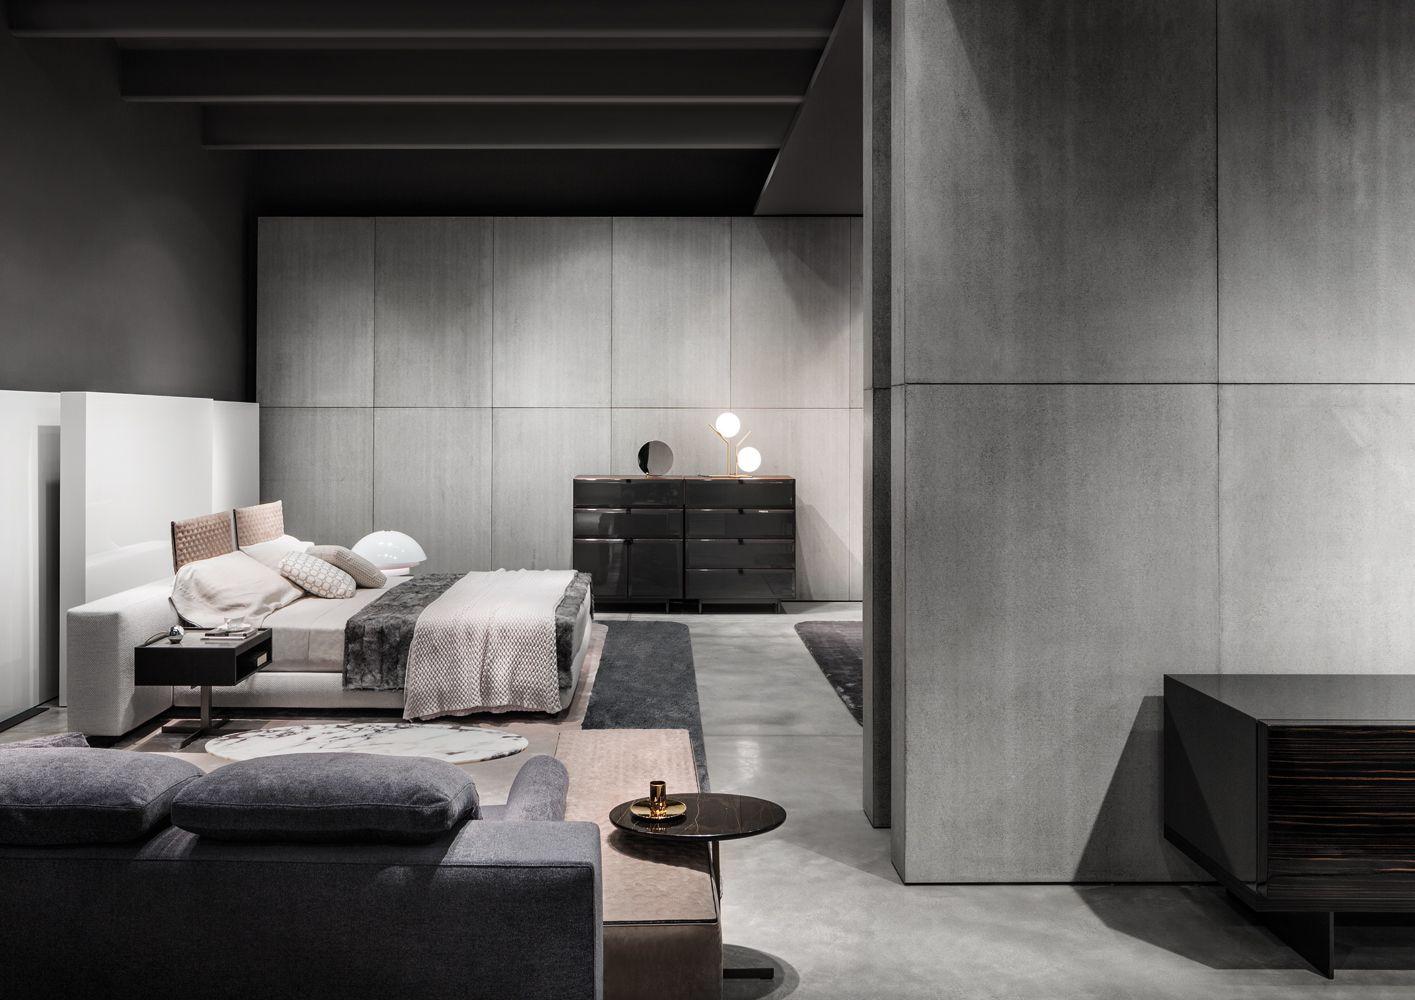 Furniture Design News minotti showroom, milan, italy | the minotti's milan showroom is